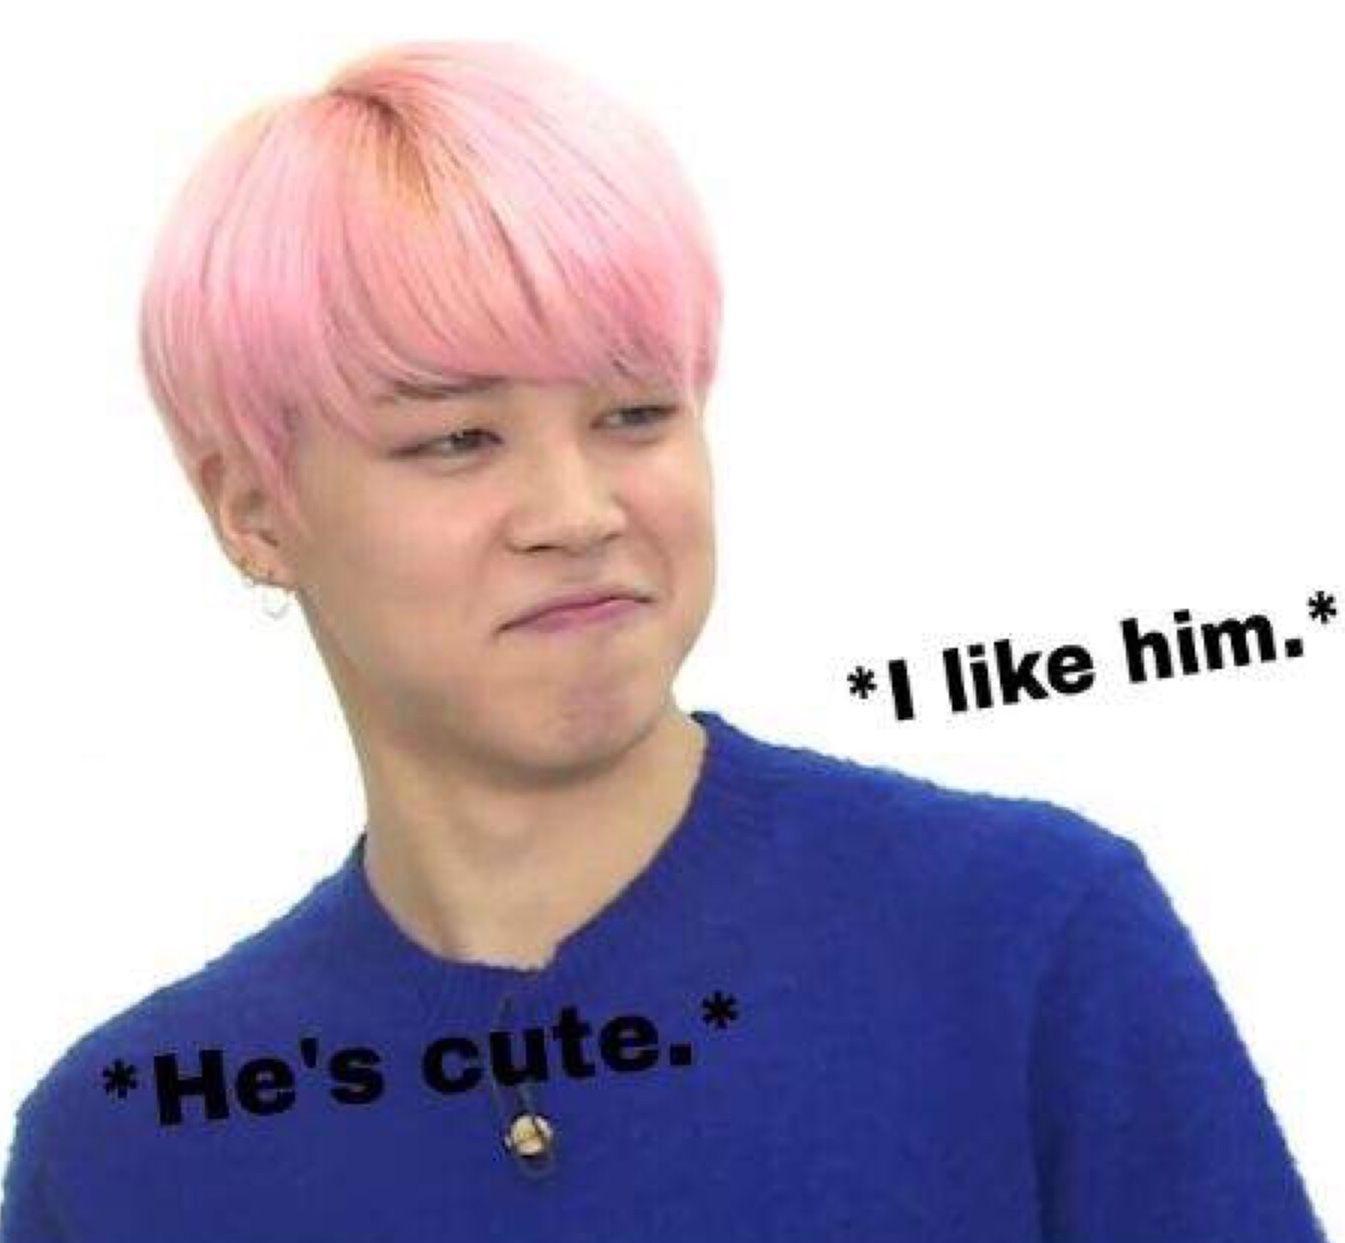 Me When I See A Member Of A Kpop Group Bts Meme Faces Meme Faces Army Memes